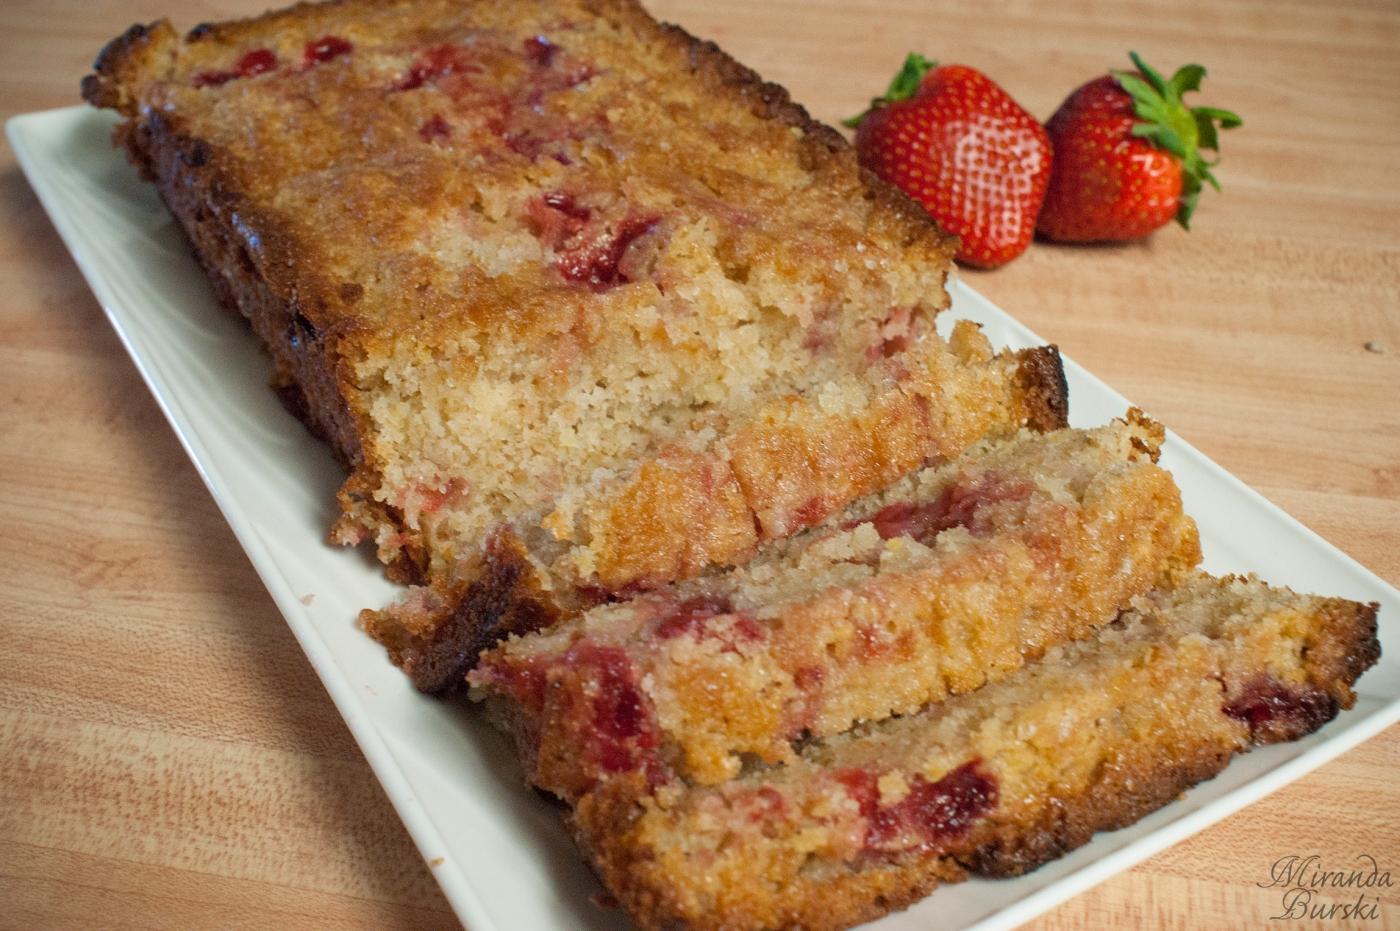 Strawberry-Swirled Lemon Loaf